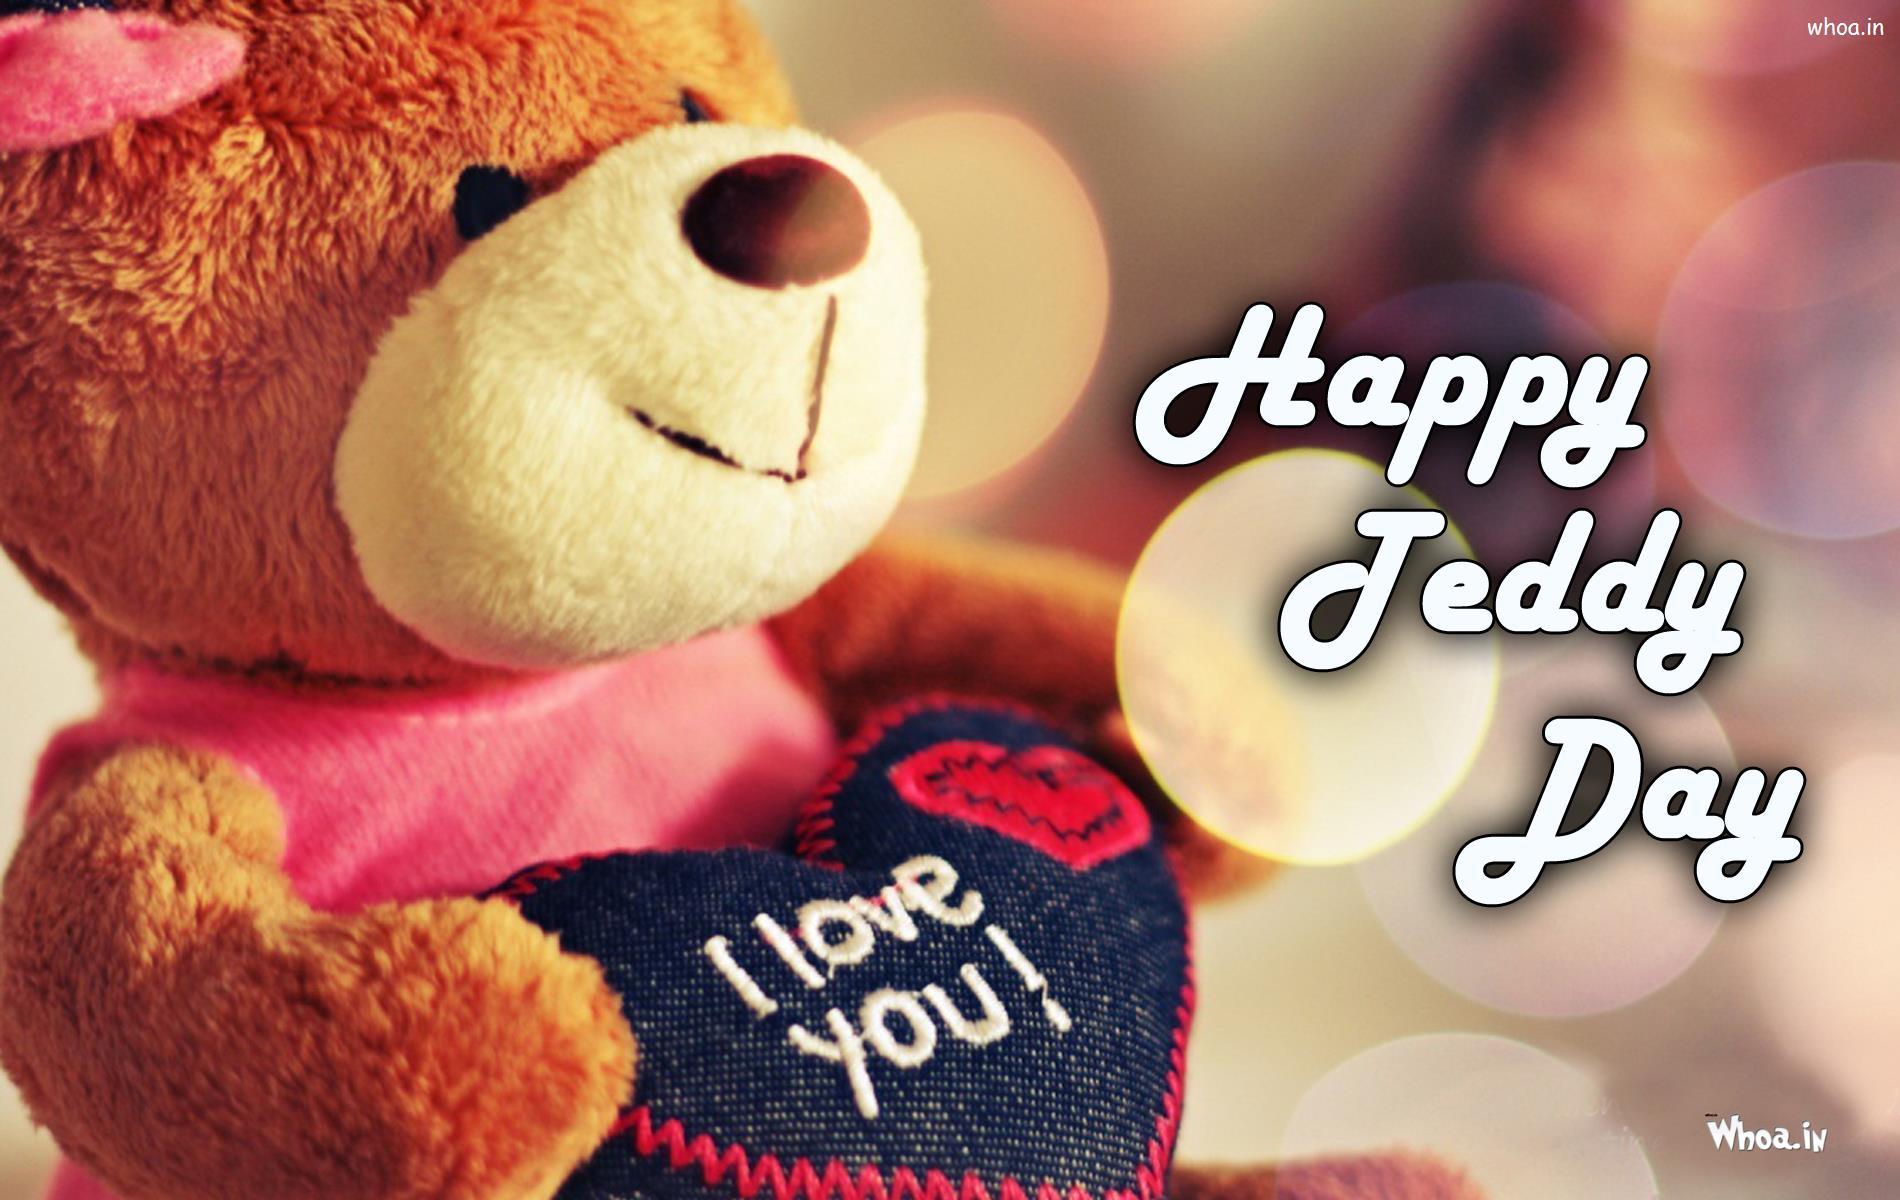 Happy teddy day greetings hd wallpaper1 whatsappgoogle happy teddy day greetings m4hsunfo